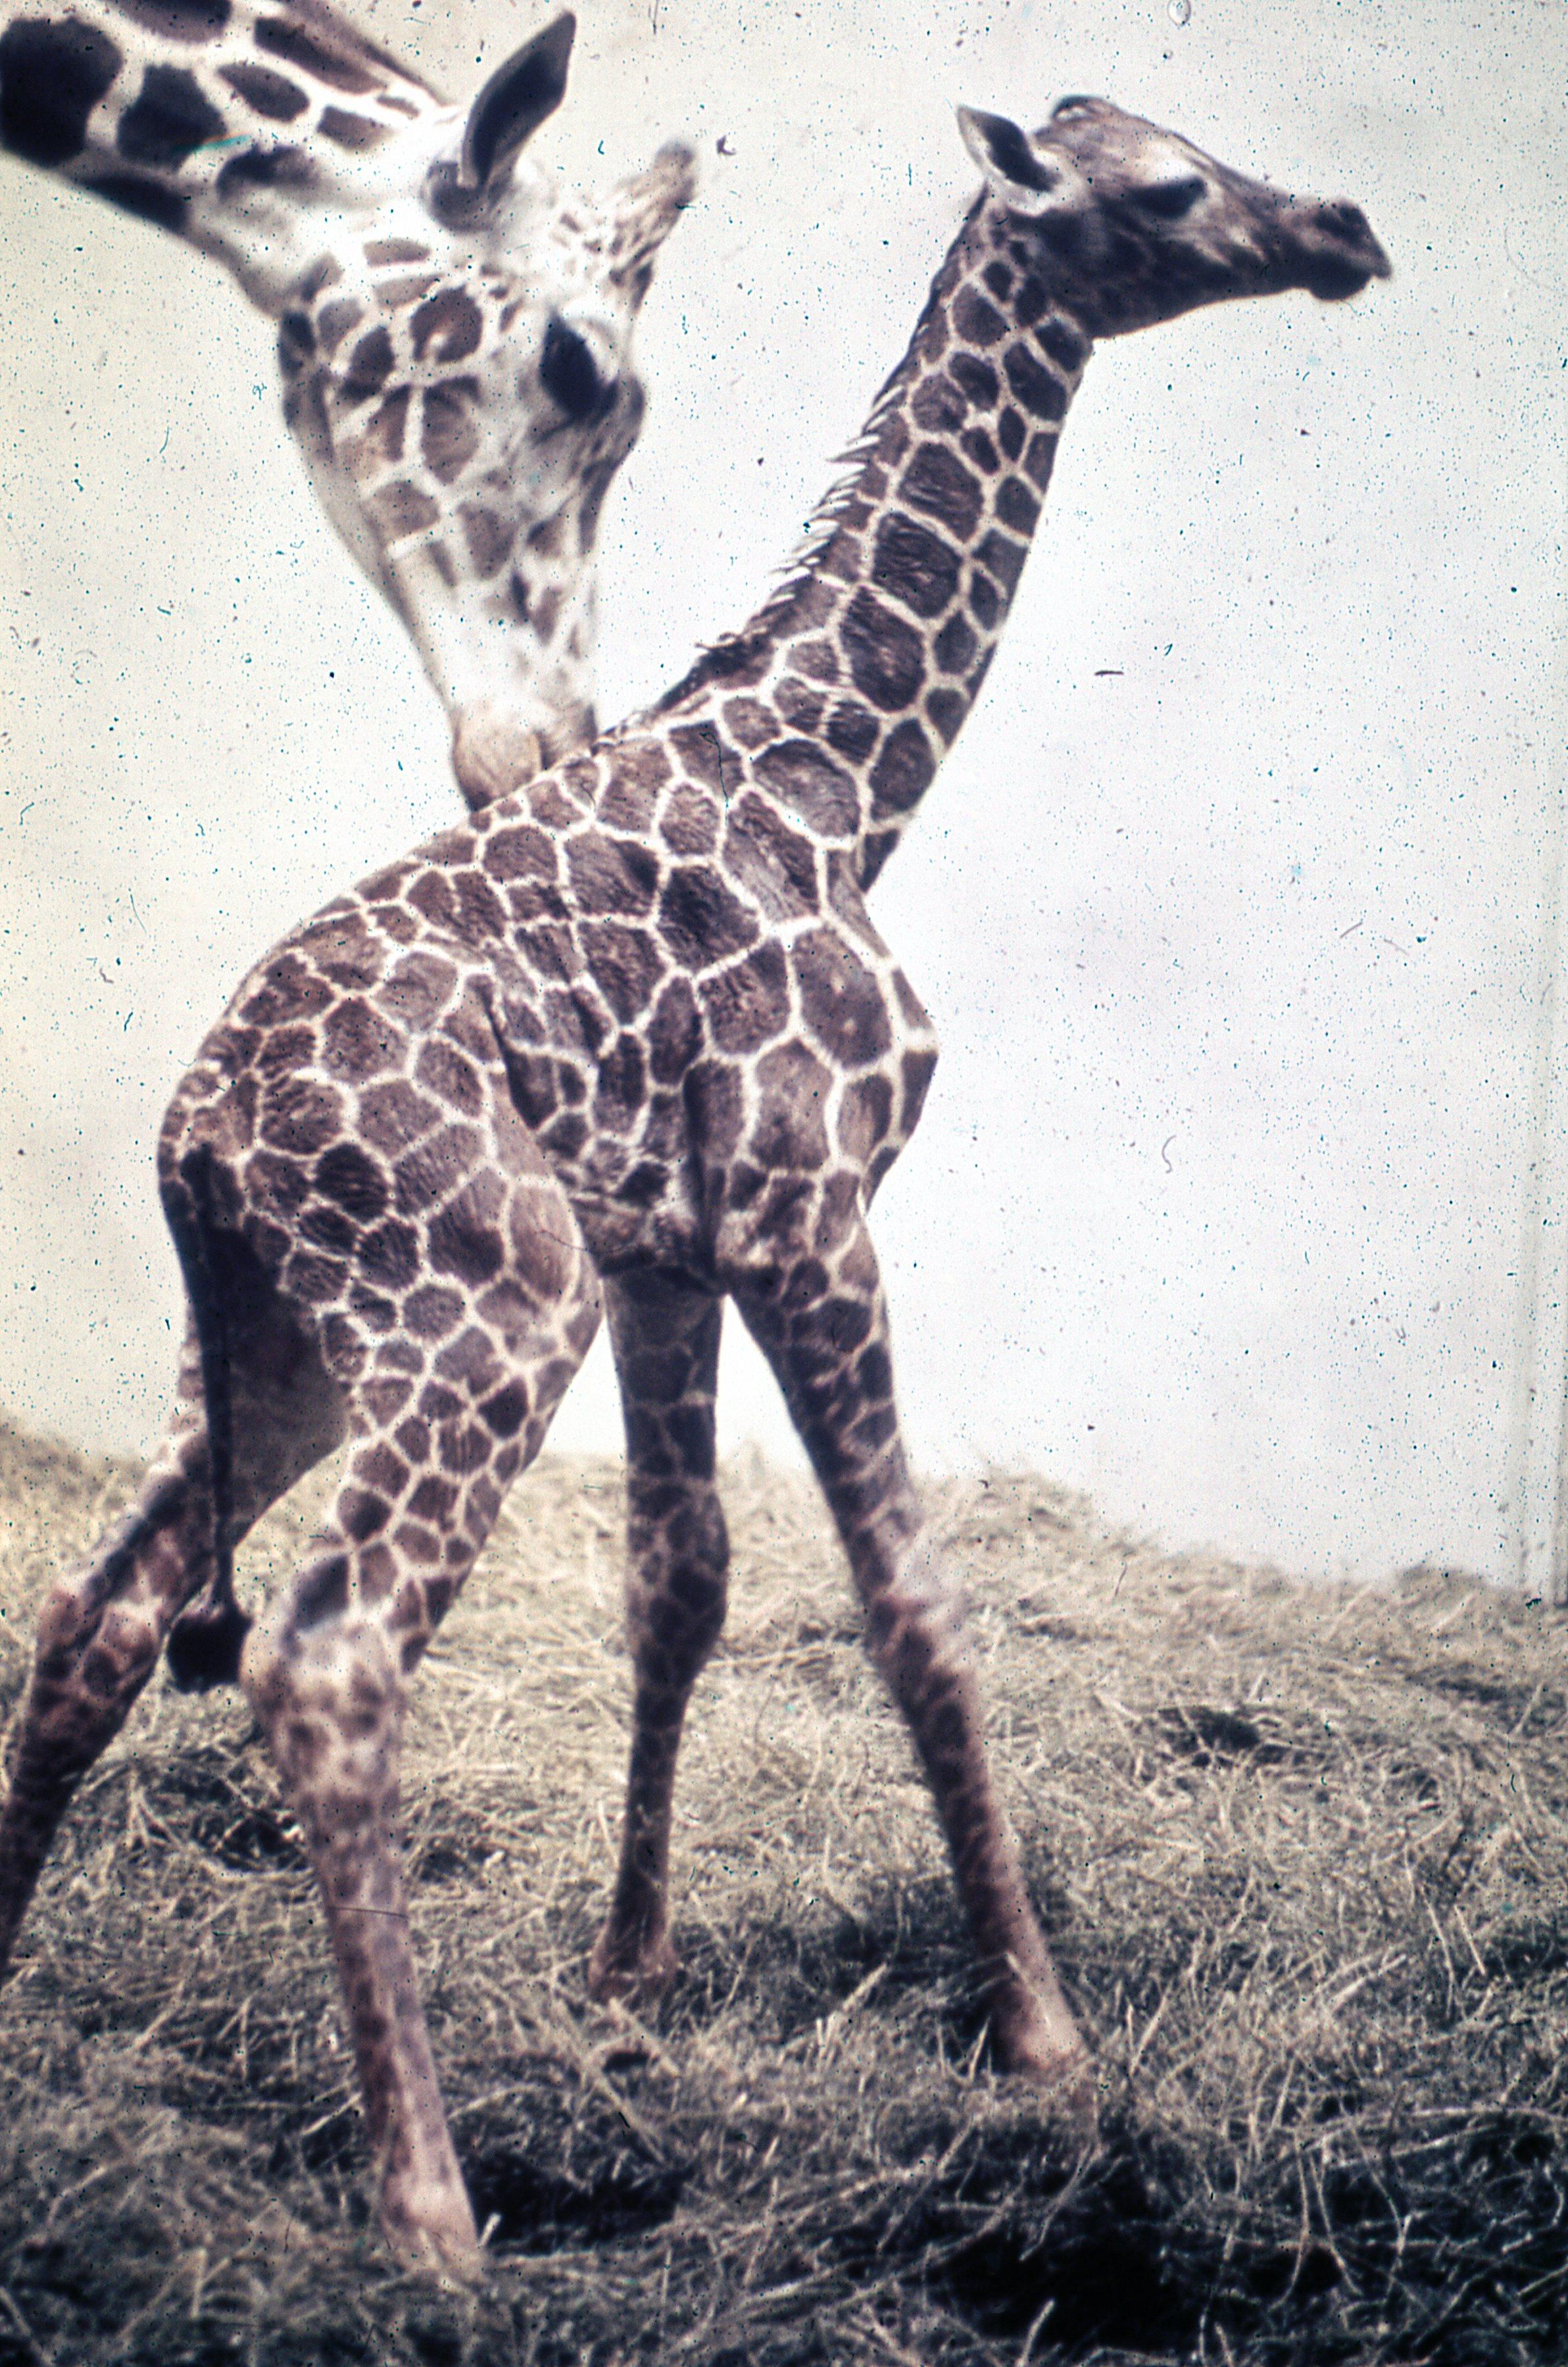 big giraffe grooming baby giraffe at Topeka Zoo